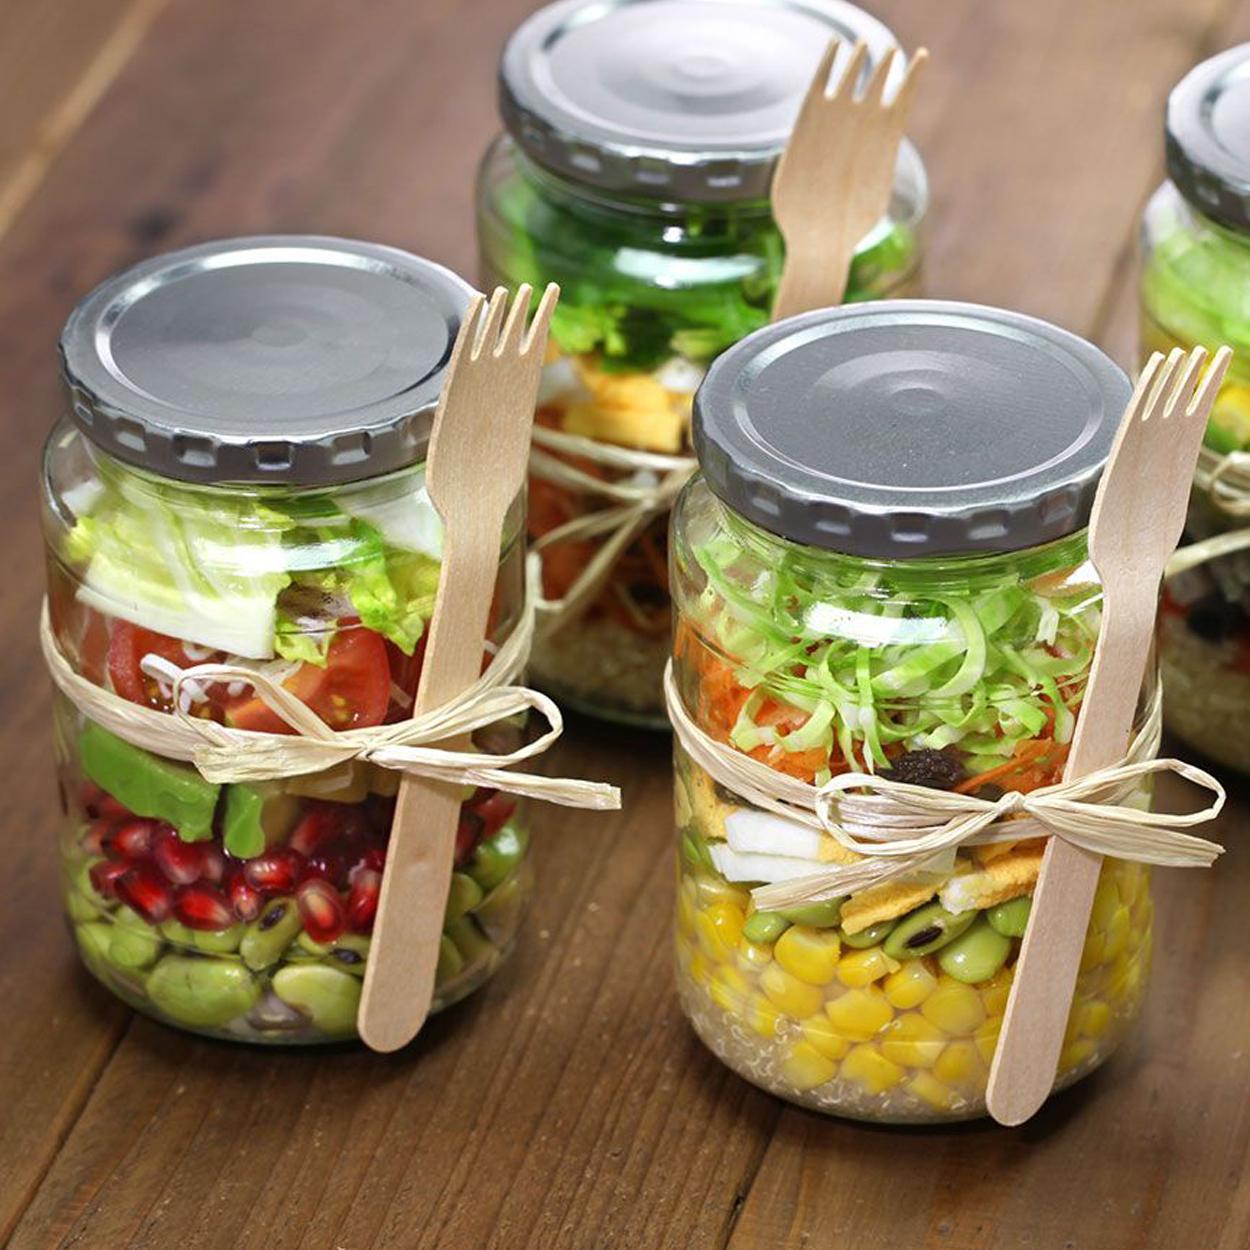 Receita para vender de salada no pote